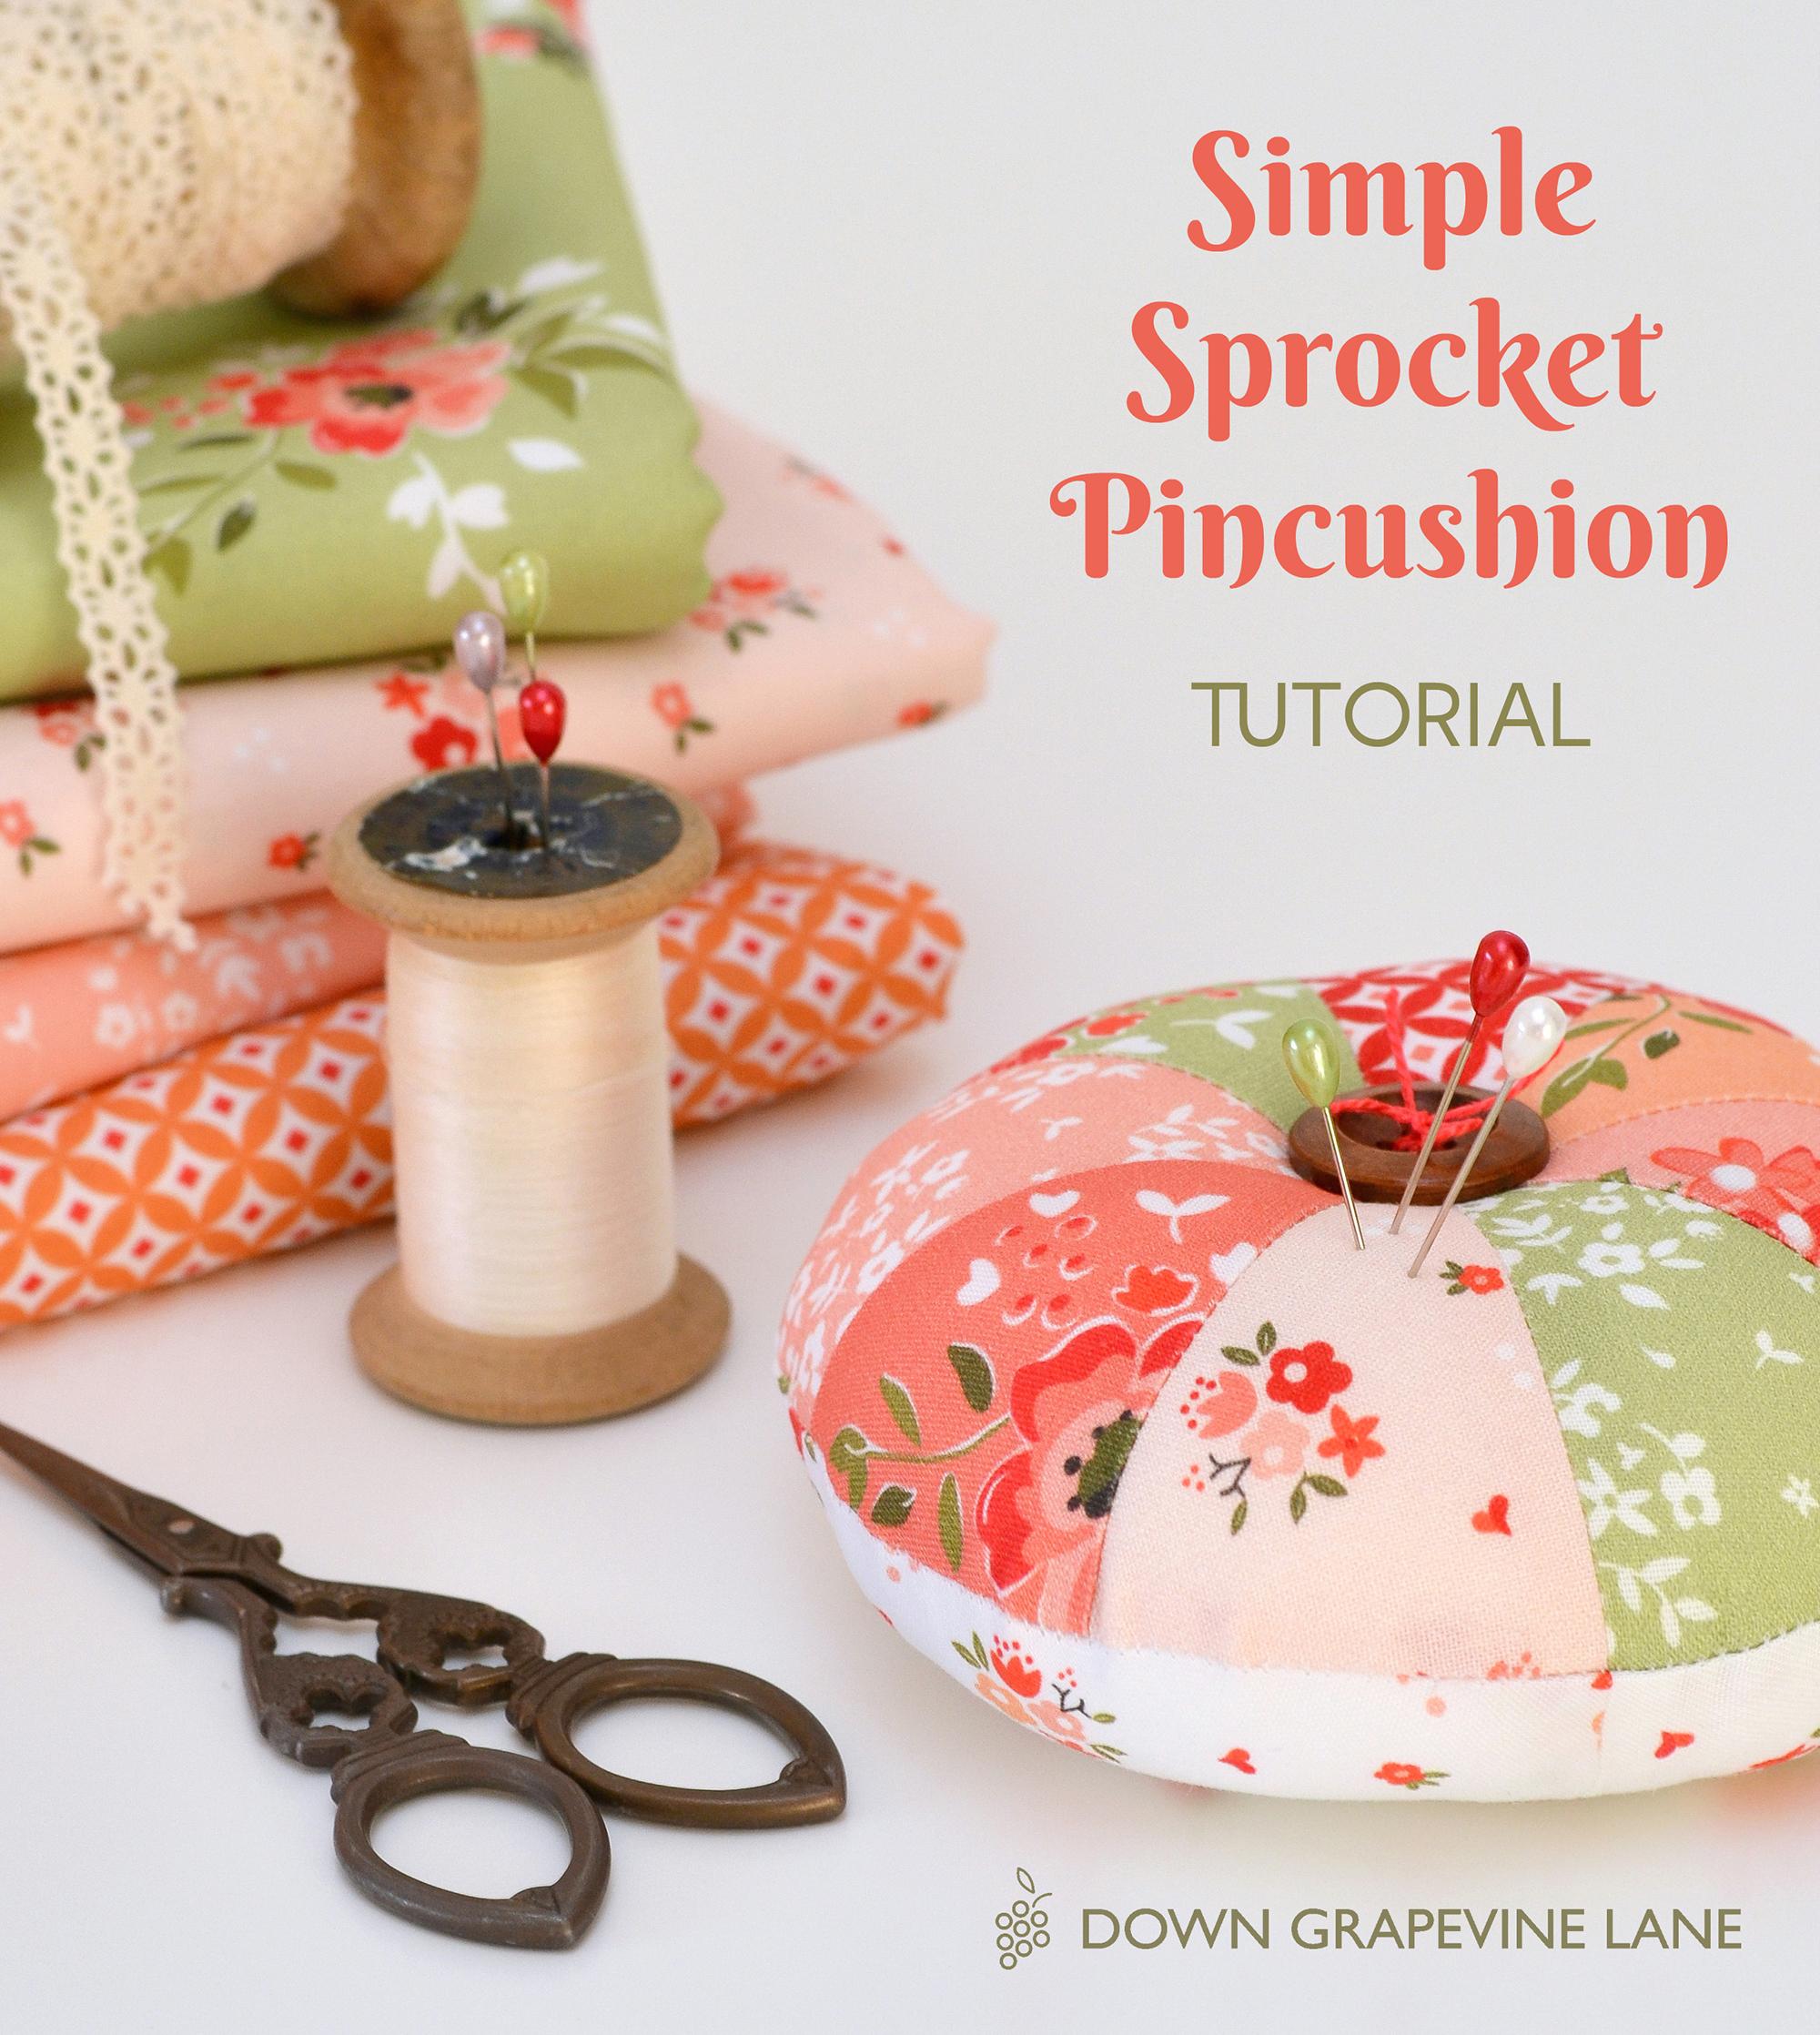 fun and easy to make kit; great Bernina fabric pincushion